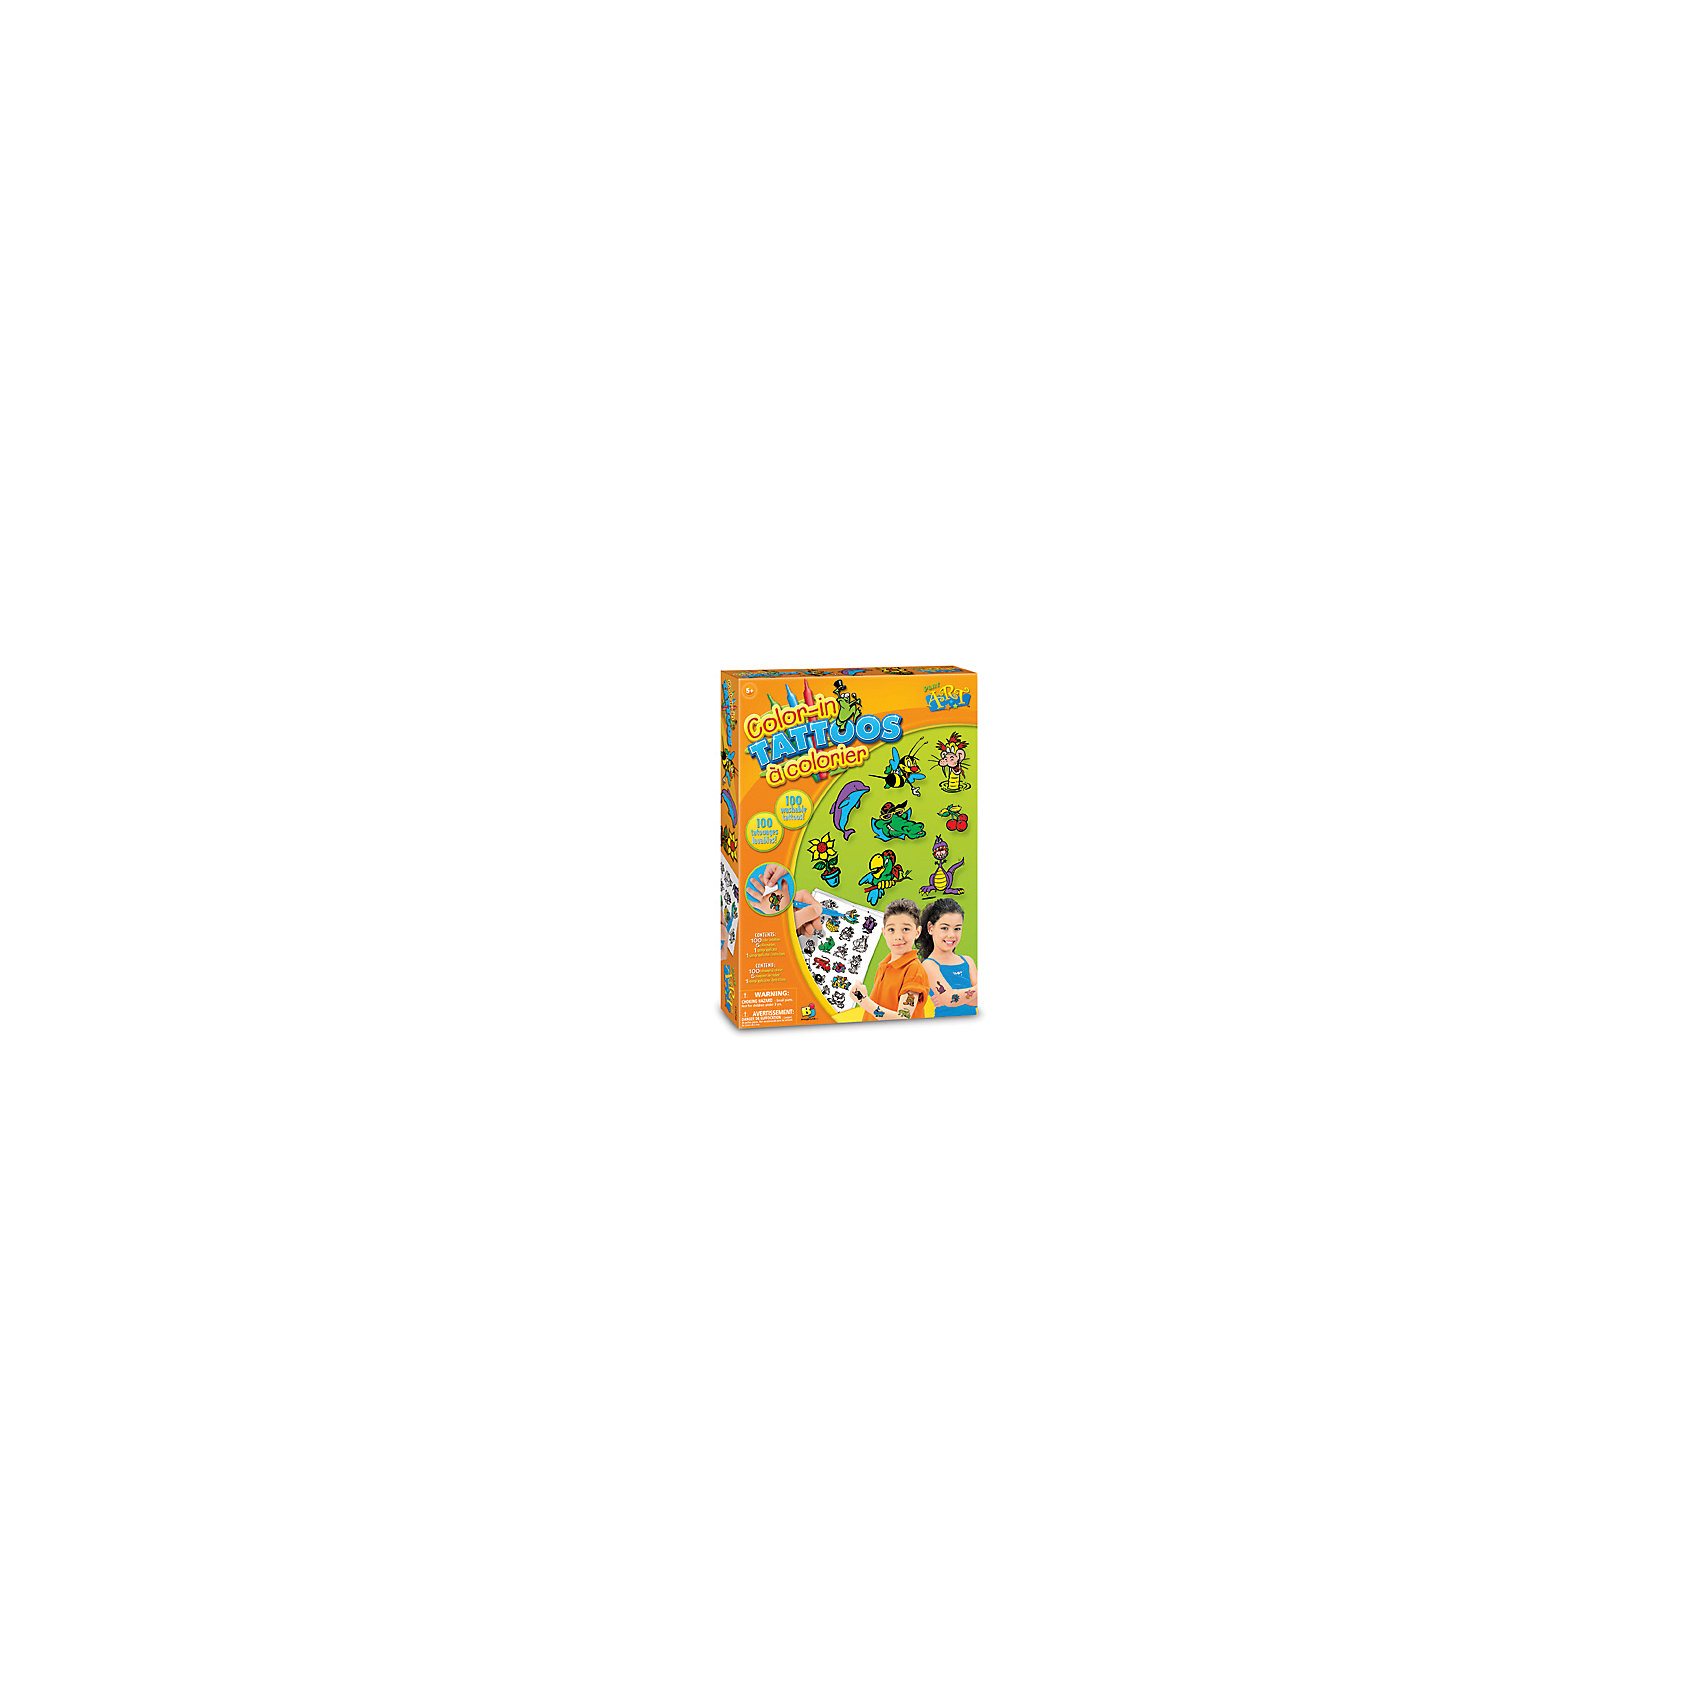 Цветные переводные татуировкиПереводные тату<br><br><br>Ширина мм: 297<br>Глубина мм: 40<br>Высота мм: 213<br>Вес г: 184<br>Возраст от месяцев: 60<br>Возраст до месяцев: 168<br>Пол: Унисекс<br>Возраст: Детский<br>SKU: 5511154